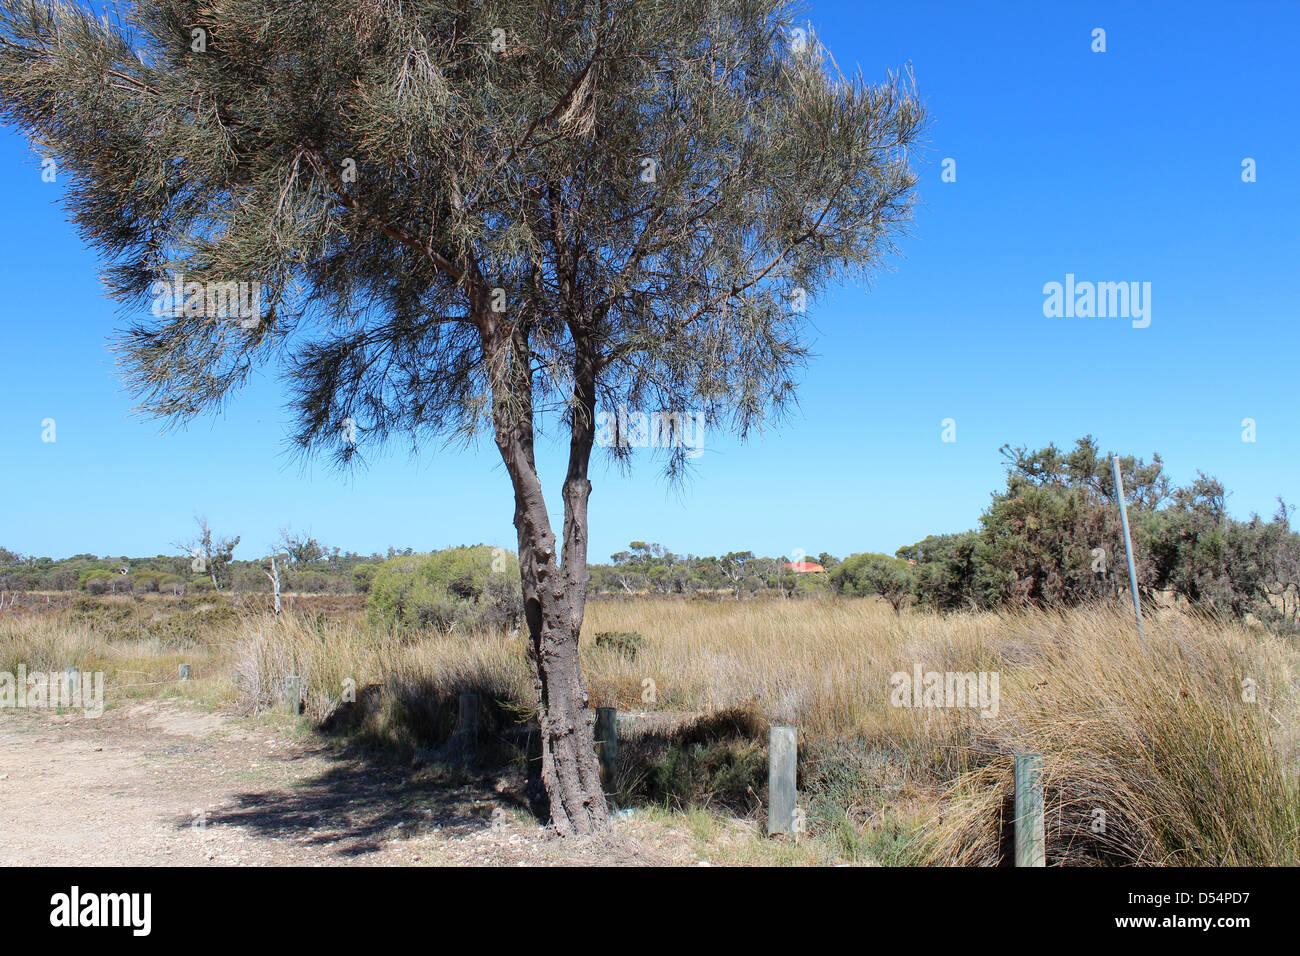 An Australian casuarina or sheoak tree is  growing by the  Leschenault estuary near Australind Western Australia - Stock Image